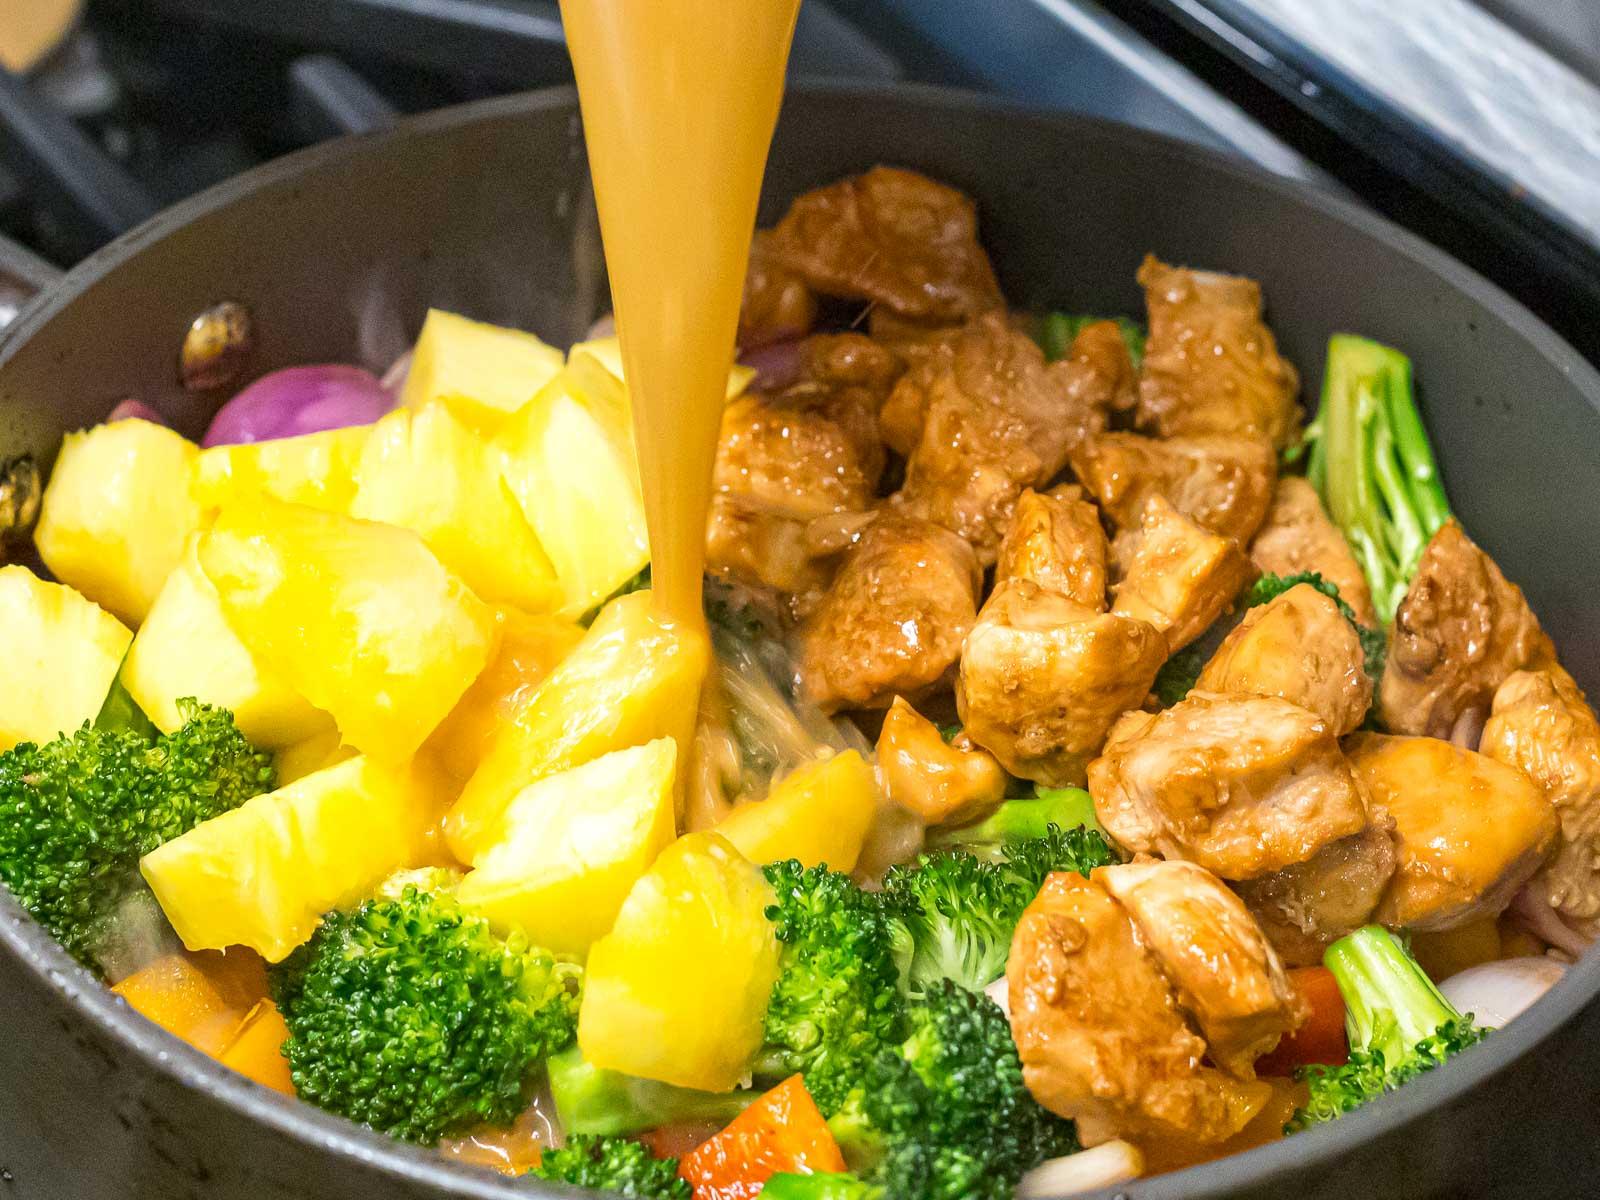 pineapple teriyaki sauce being added to pineapple chicken